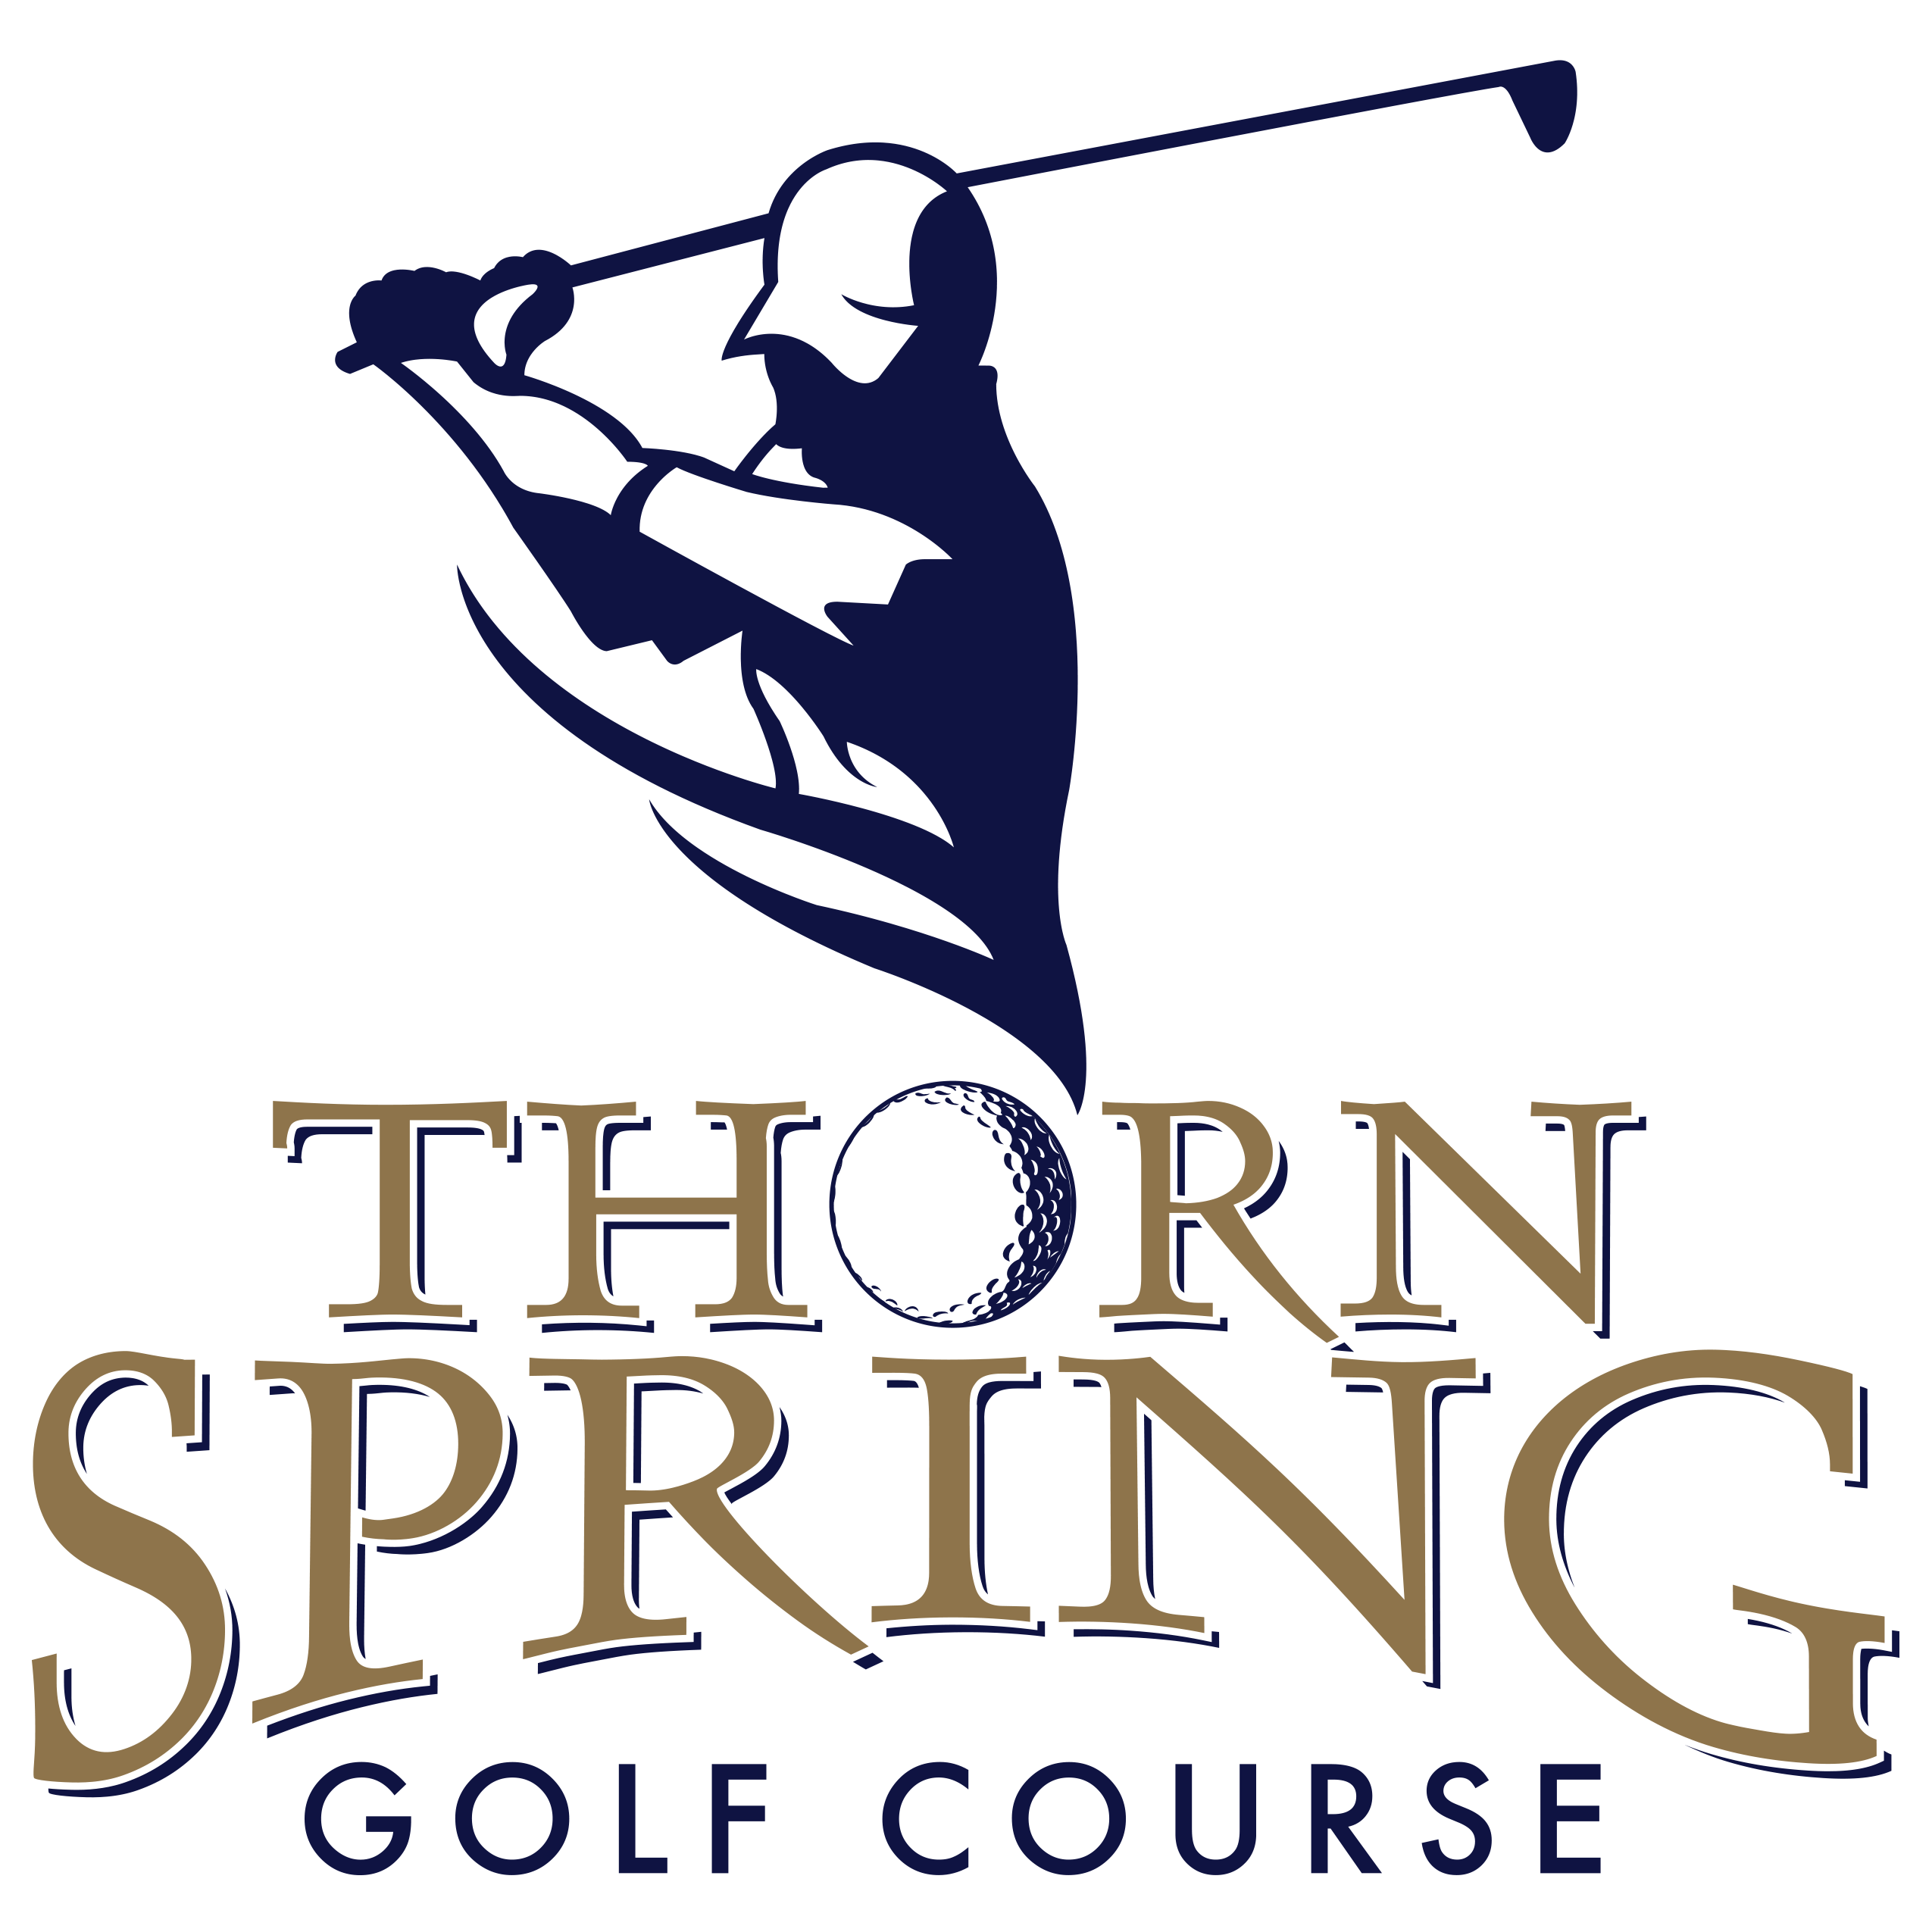 Thronspring Golf Course